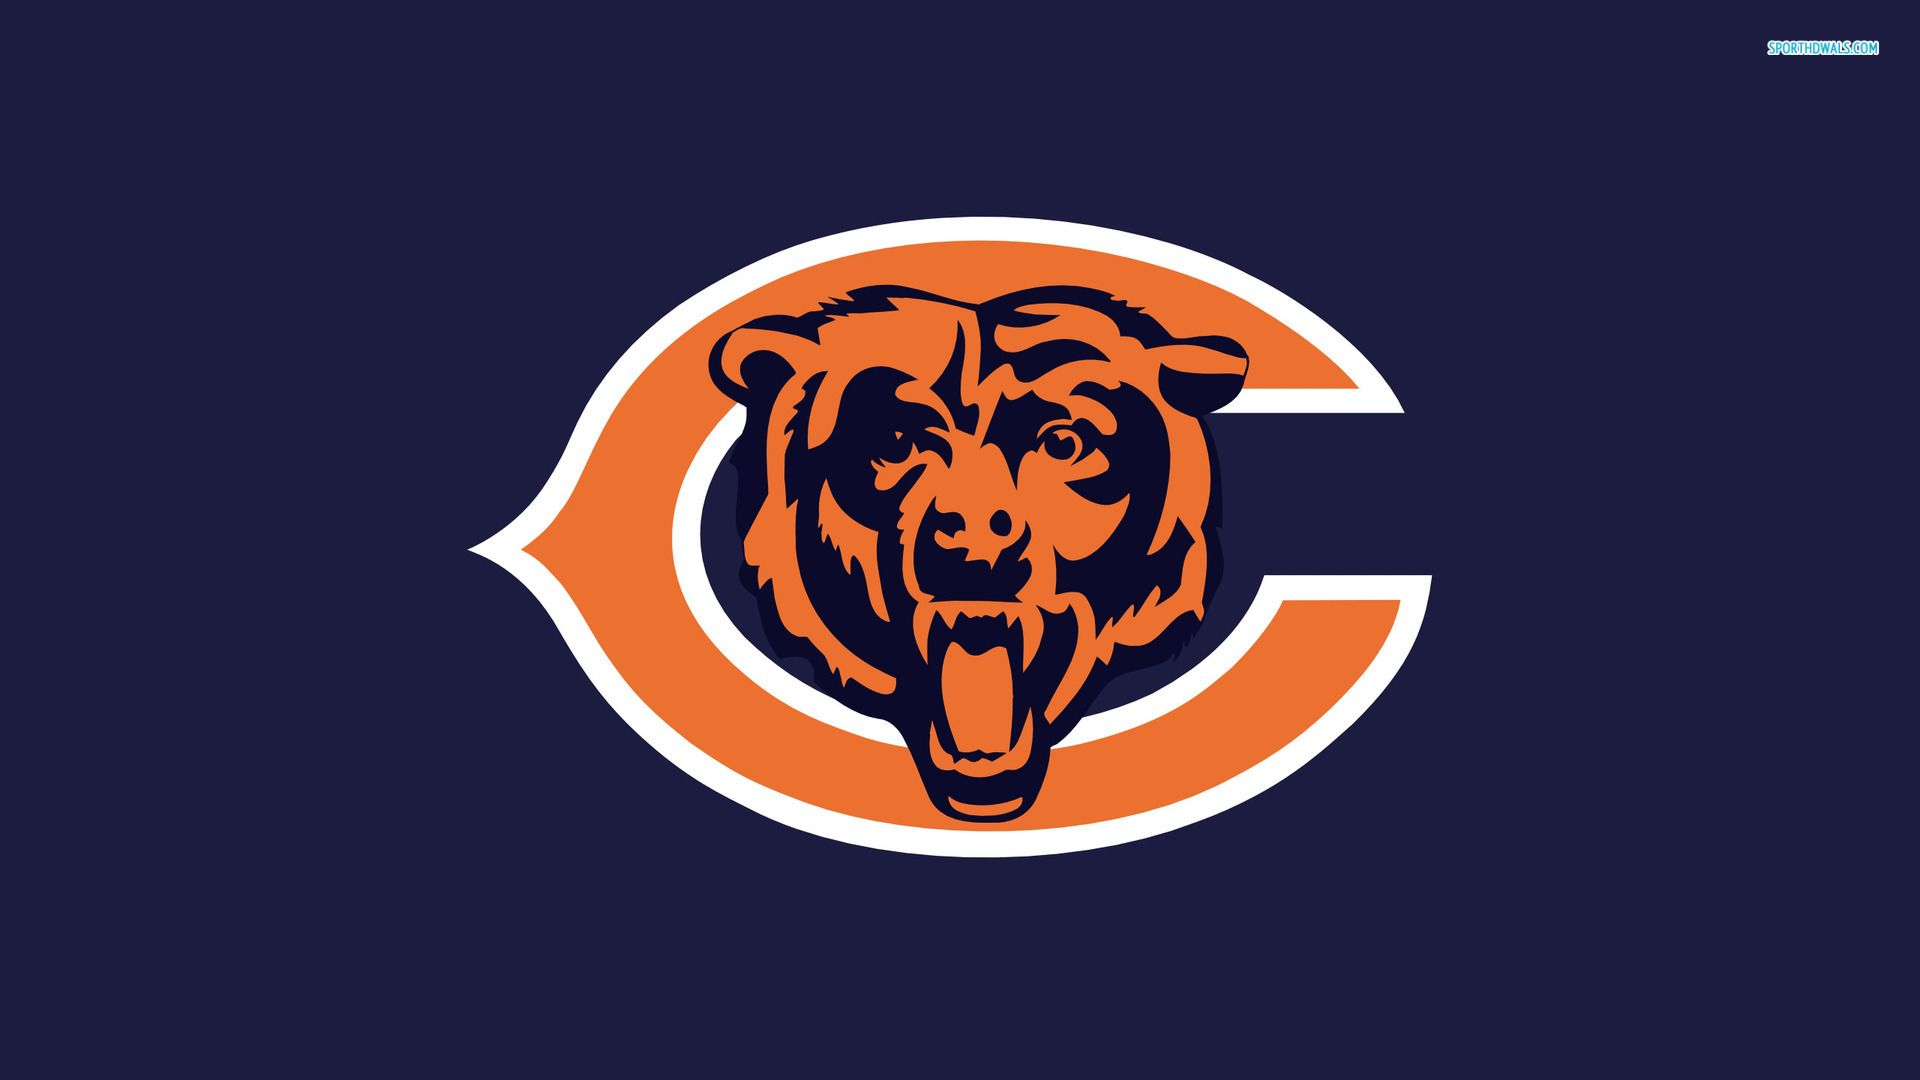 Chicago Bears Chicago Bears Wallpaper 1920x1080 Chicago Bears Logo Chicago Bears Wallpaper Sports